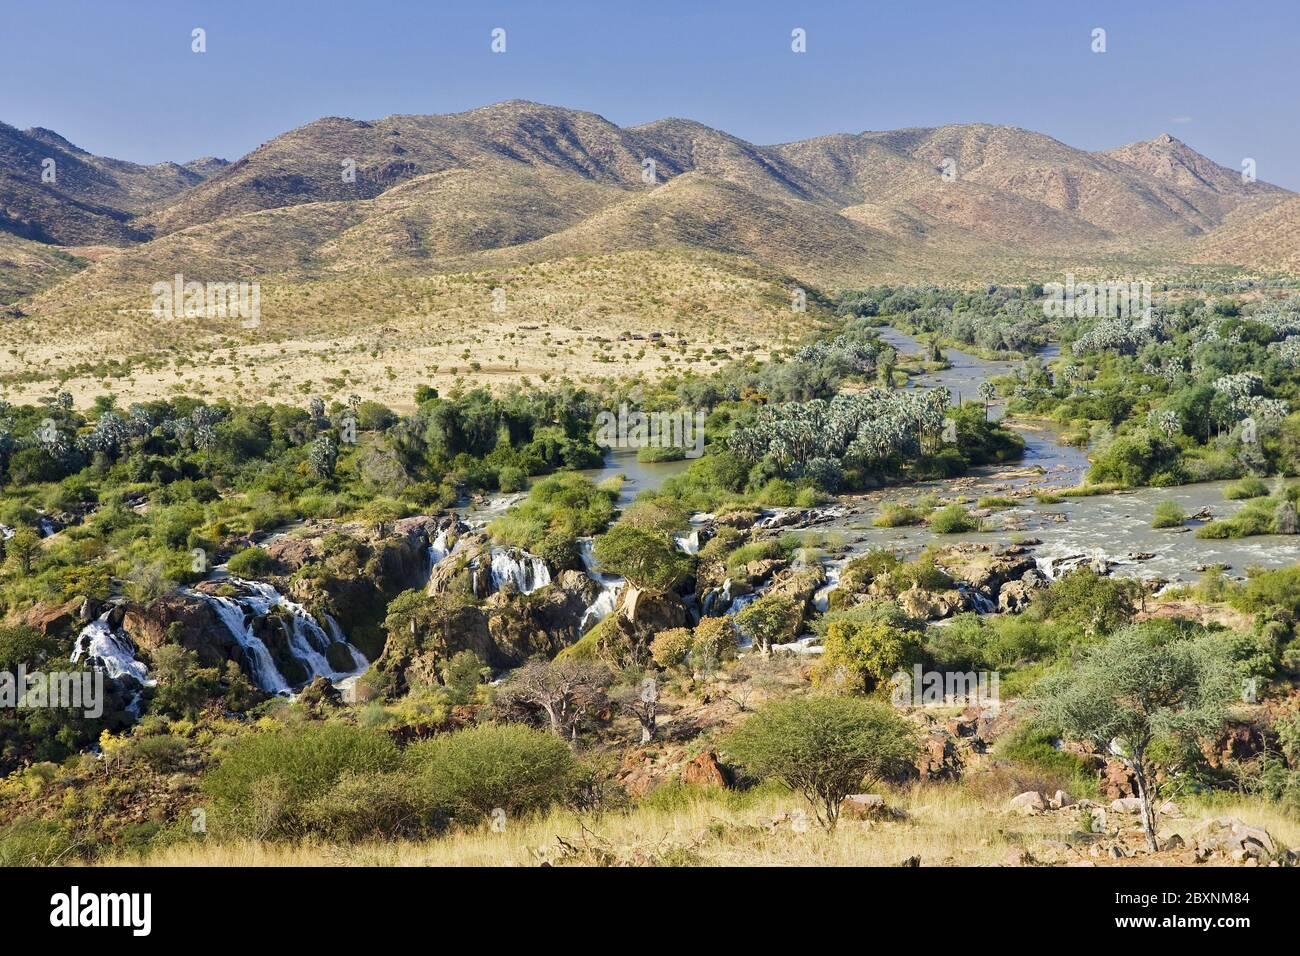 Kunene River, Kaokoveld, Namibia, Afrika, Epupa Falls, Africa Stock Photo